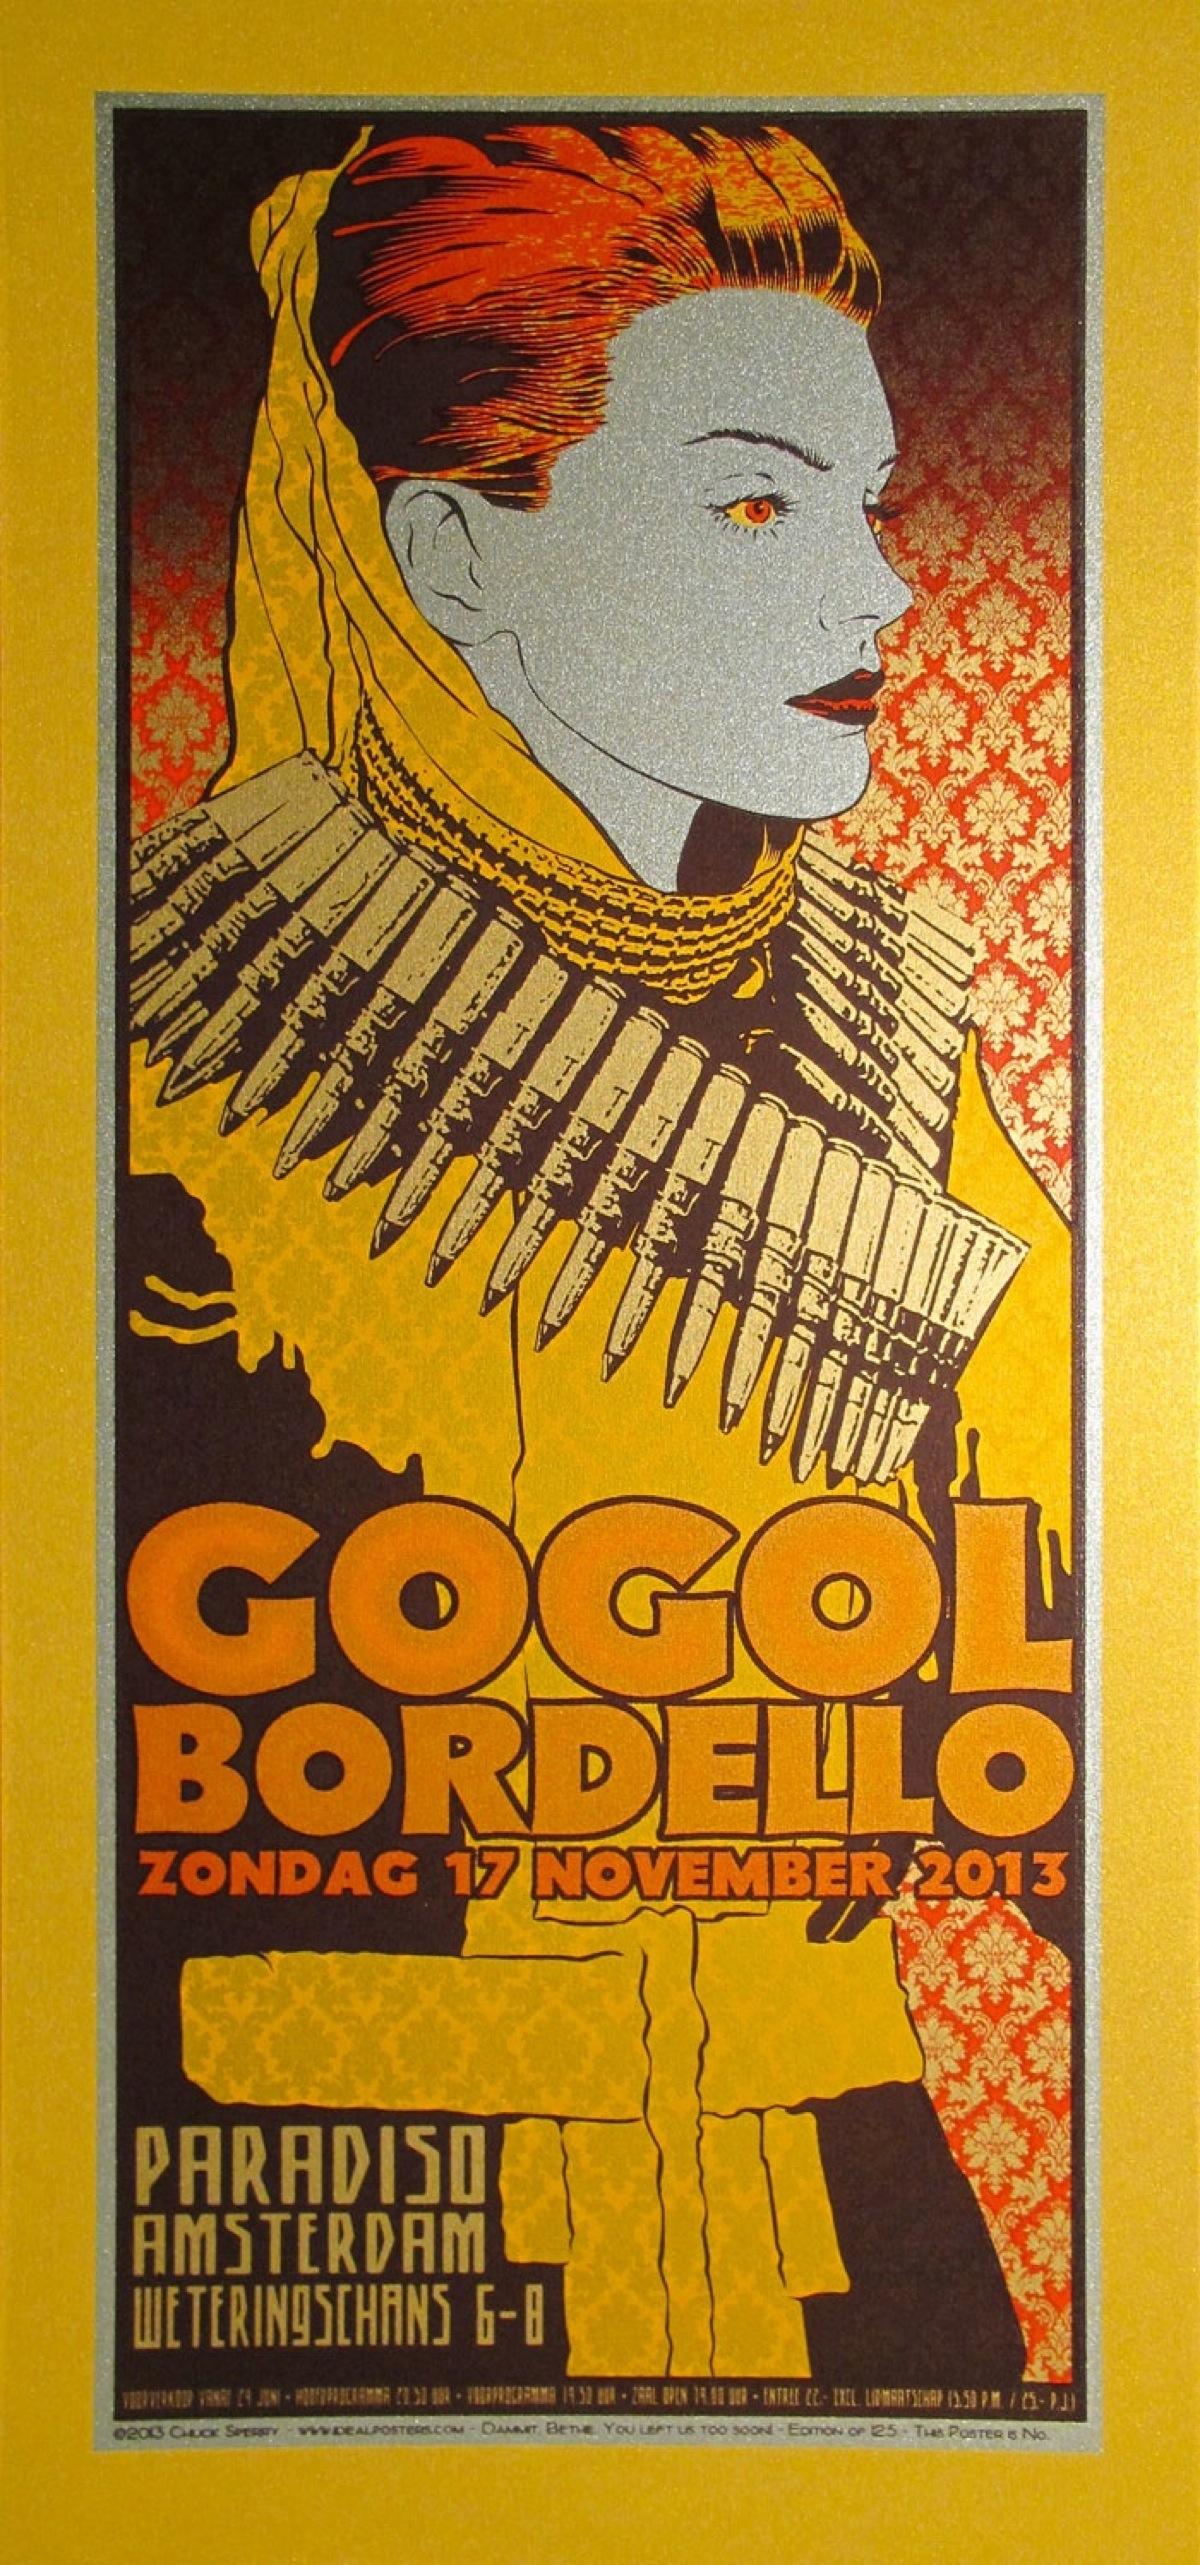 GOGOL-BORDELLO-GOLD